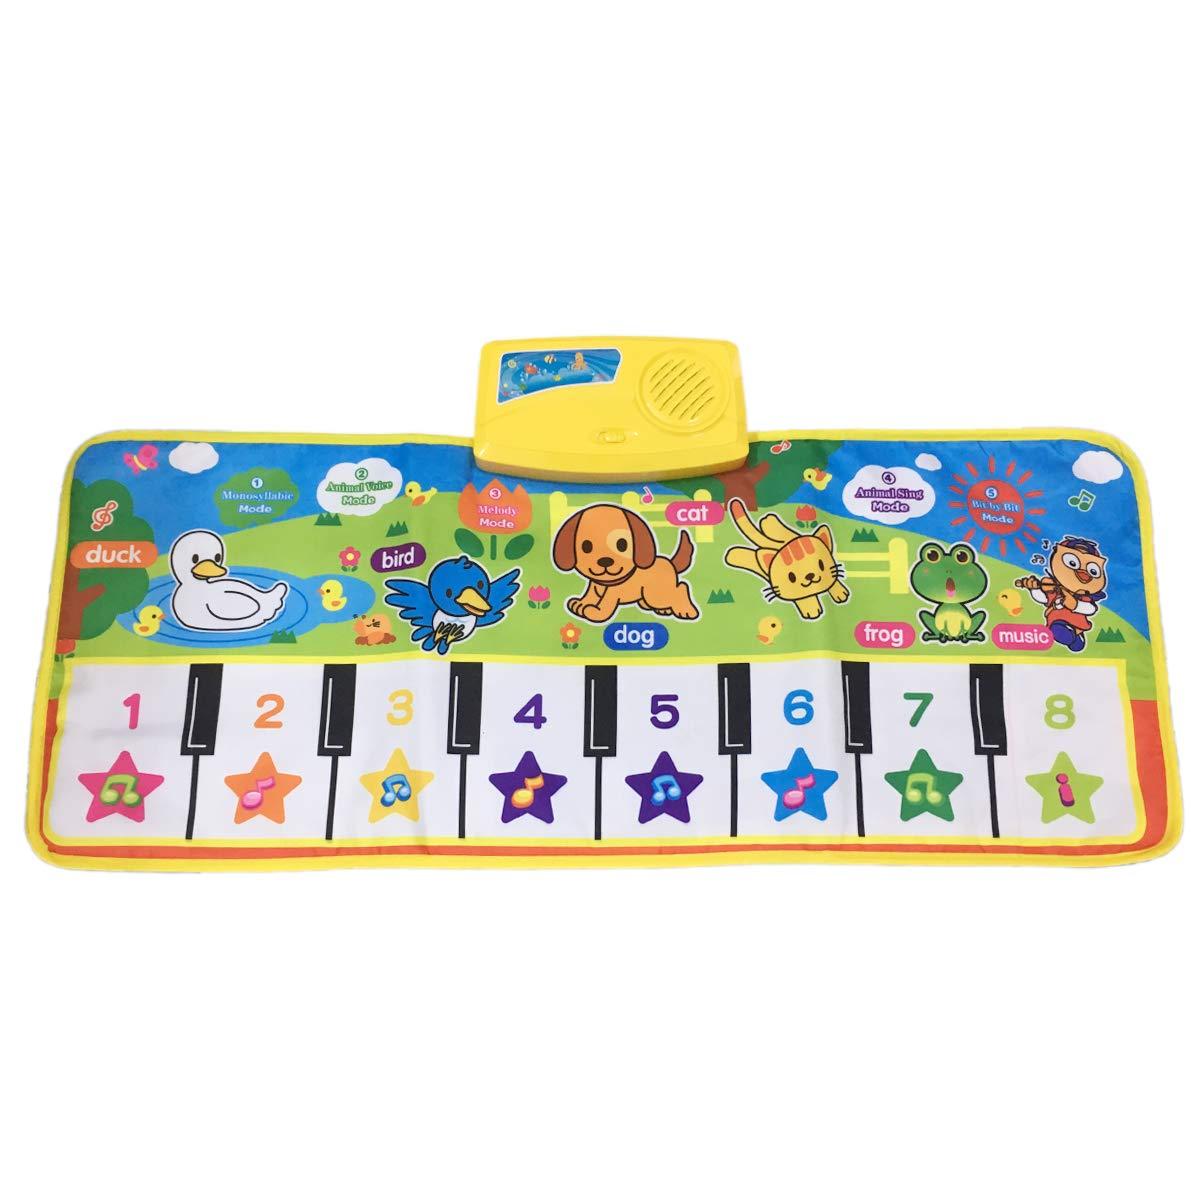 Fresh Household Piano Mat, Kids Music Mat Dance Mat Playmat Education Toy Birthday Christmas Easter Day Gift for Boys Girls